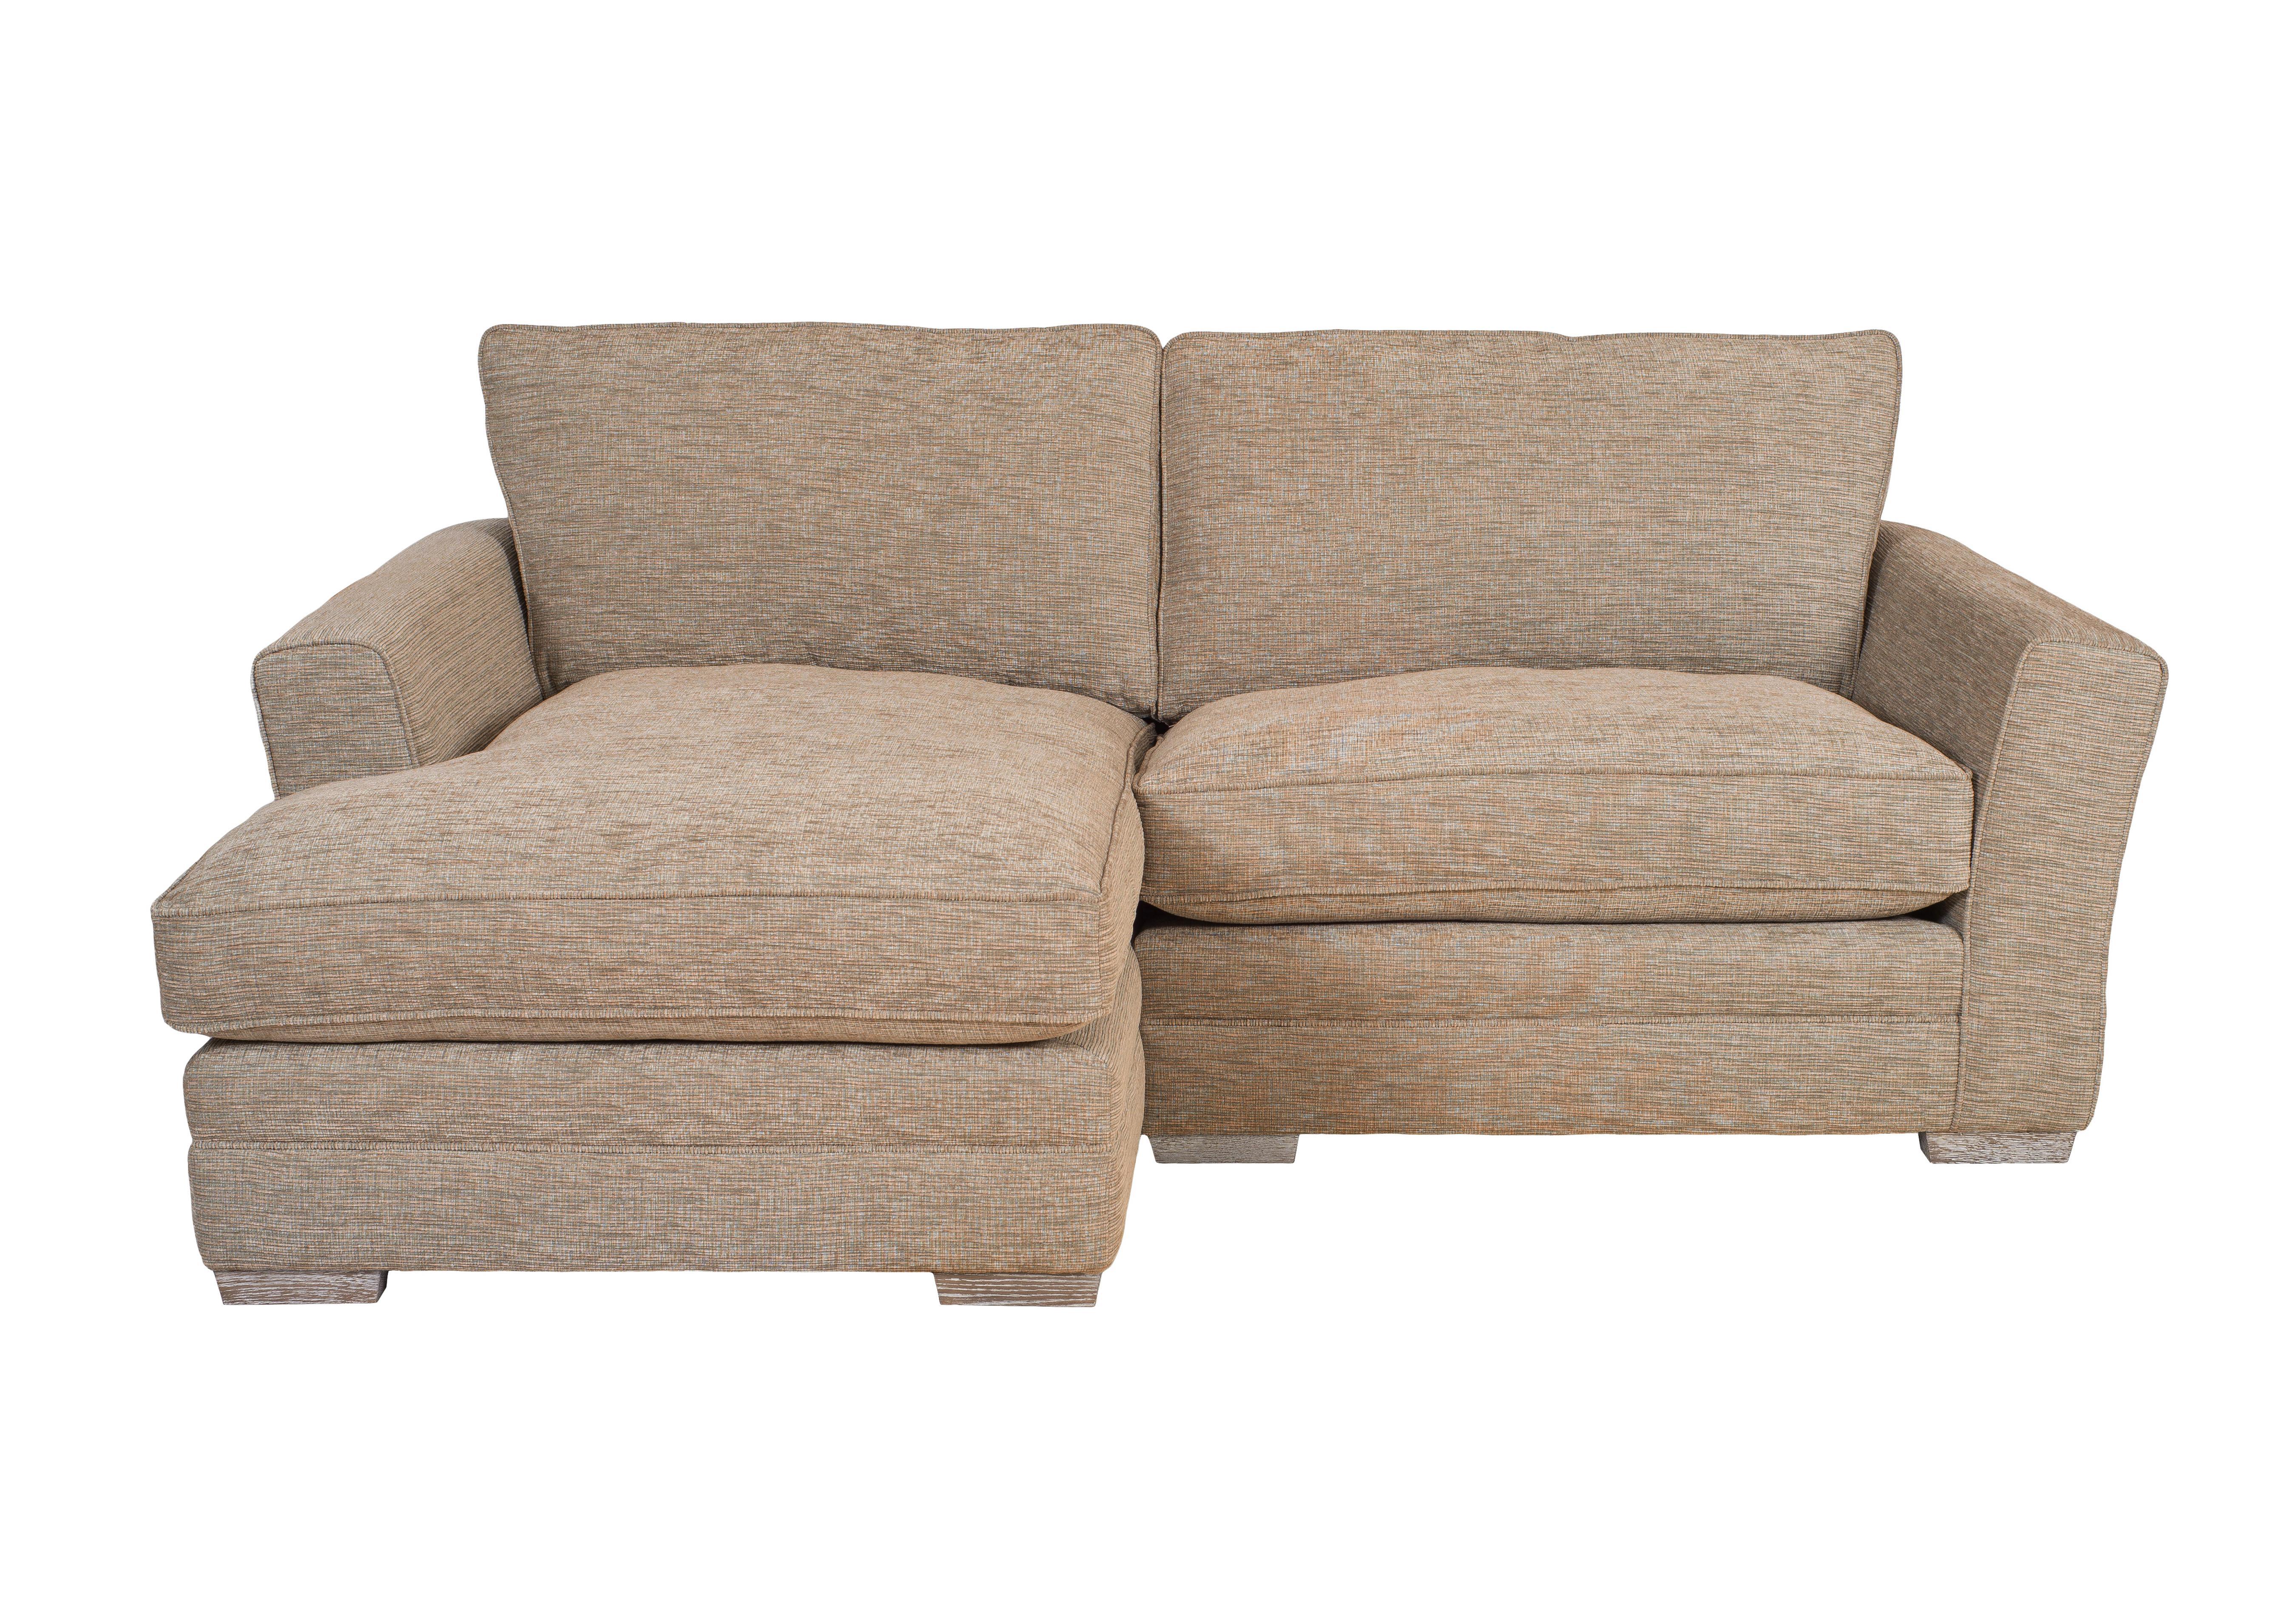 Ashridge Small Fabric Corner Chaise